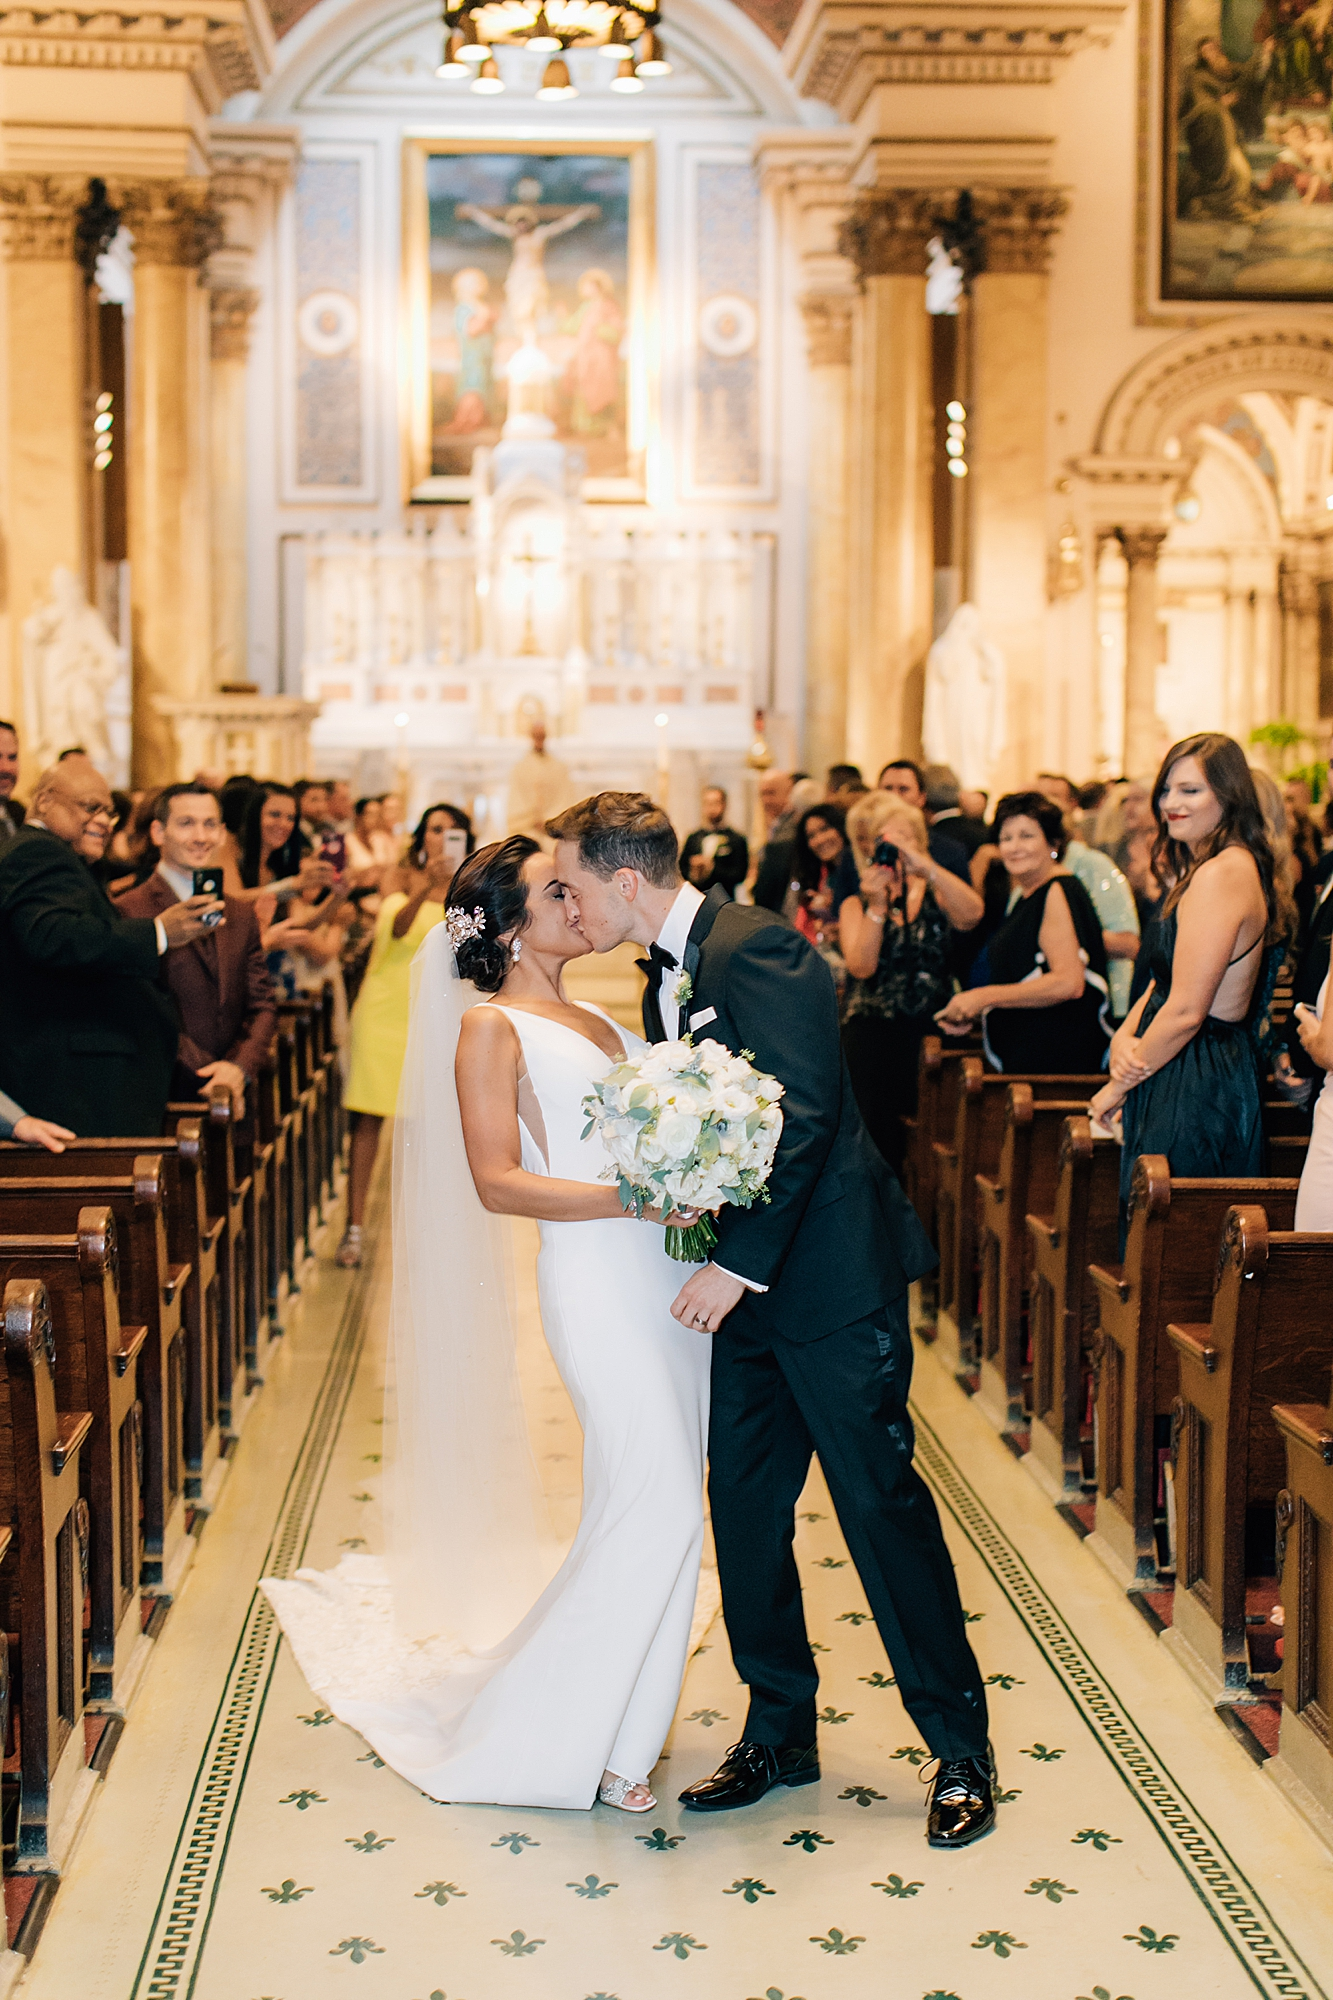 Cescaphe Philadelphia Film Wedding Photography by Magdalena Studios 20